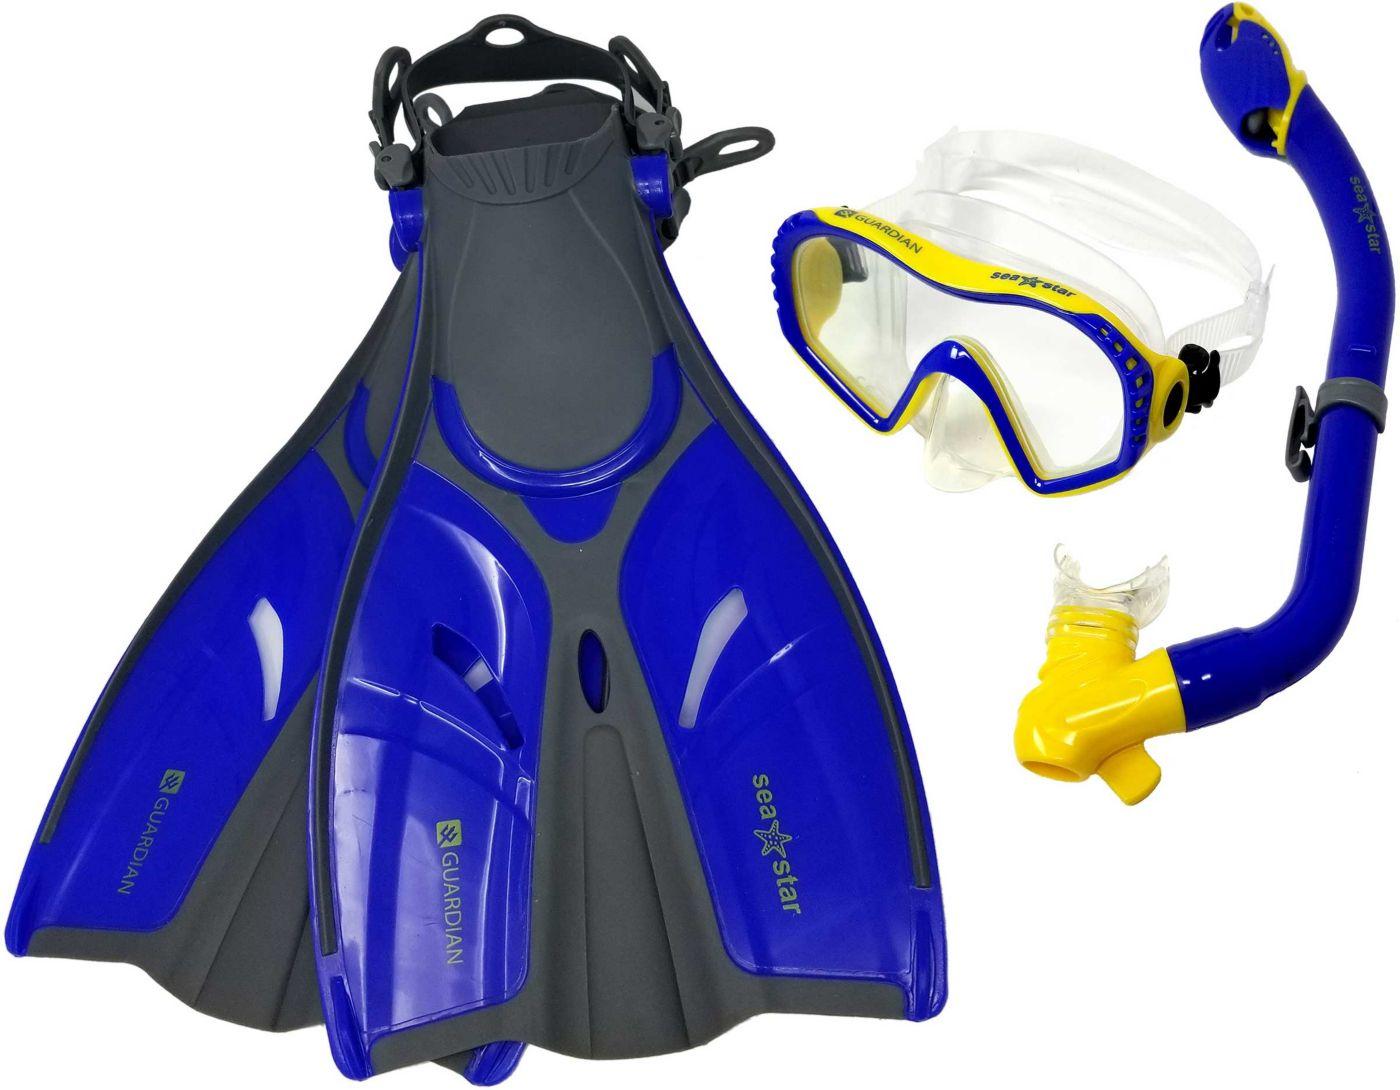 Guardian Sea Star Youth Snorkeling Set